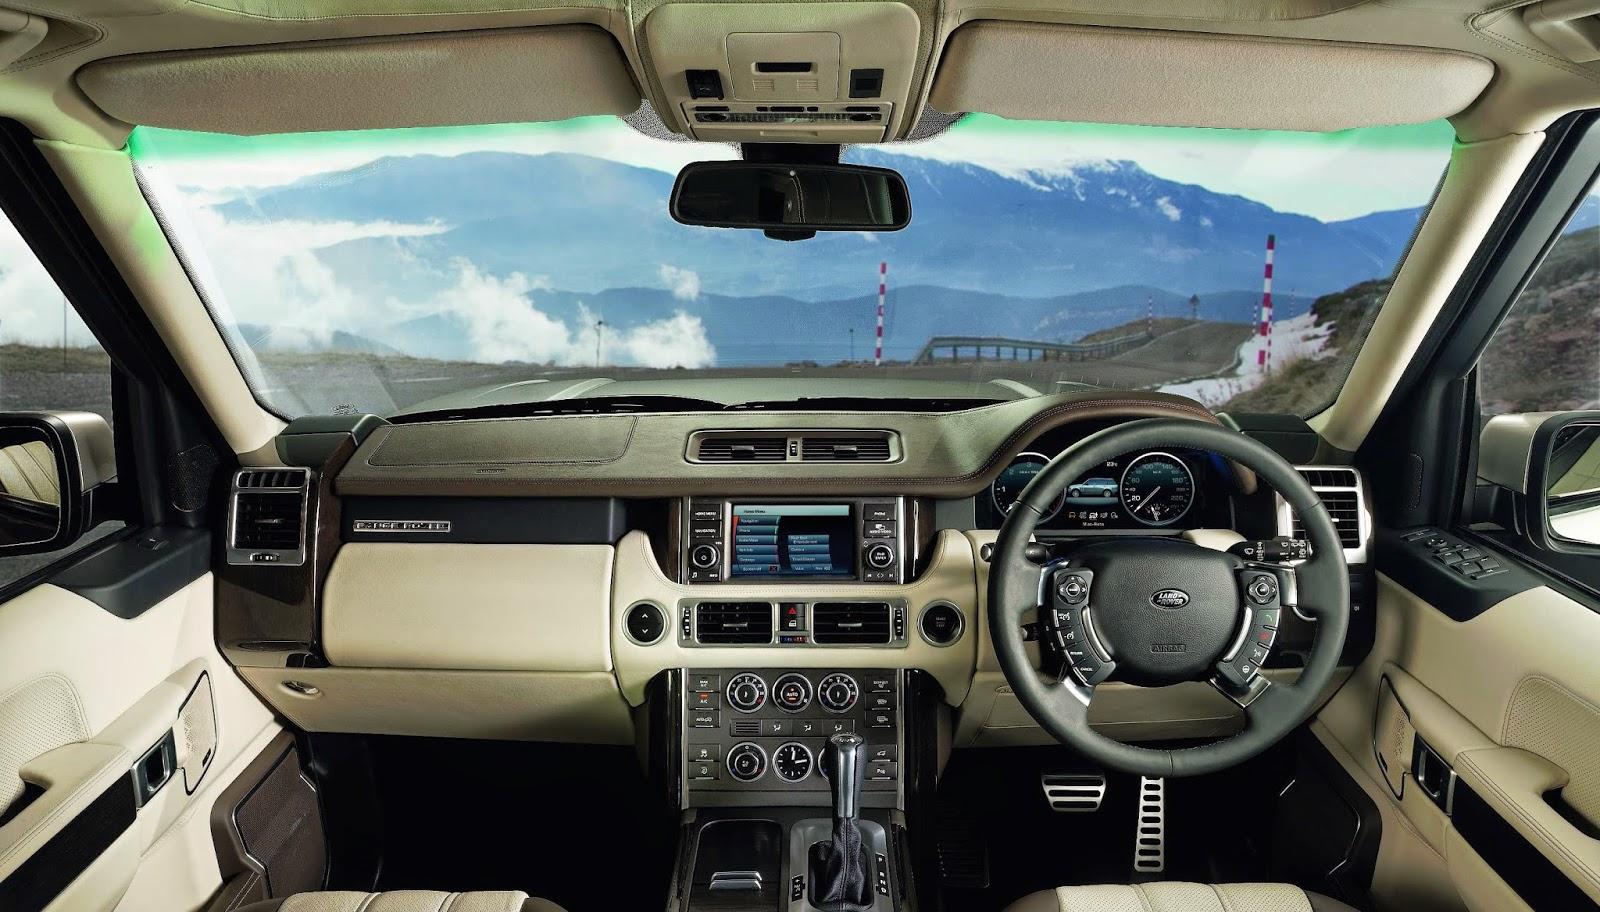 Land Rover Range Rover L322 interior